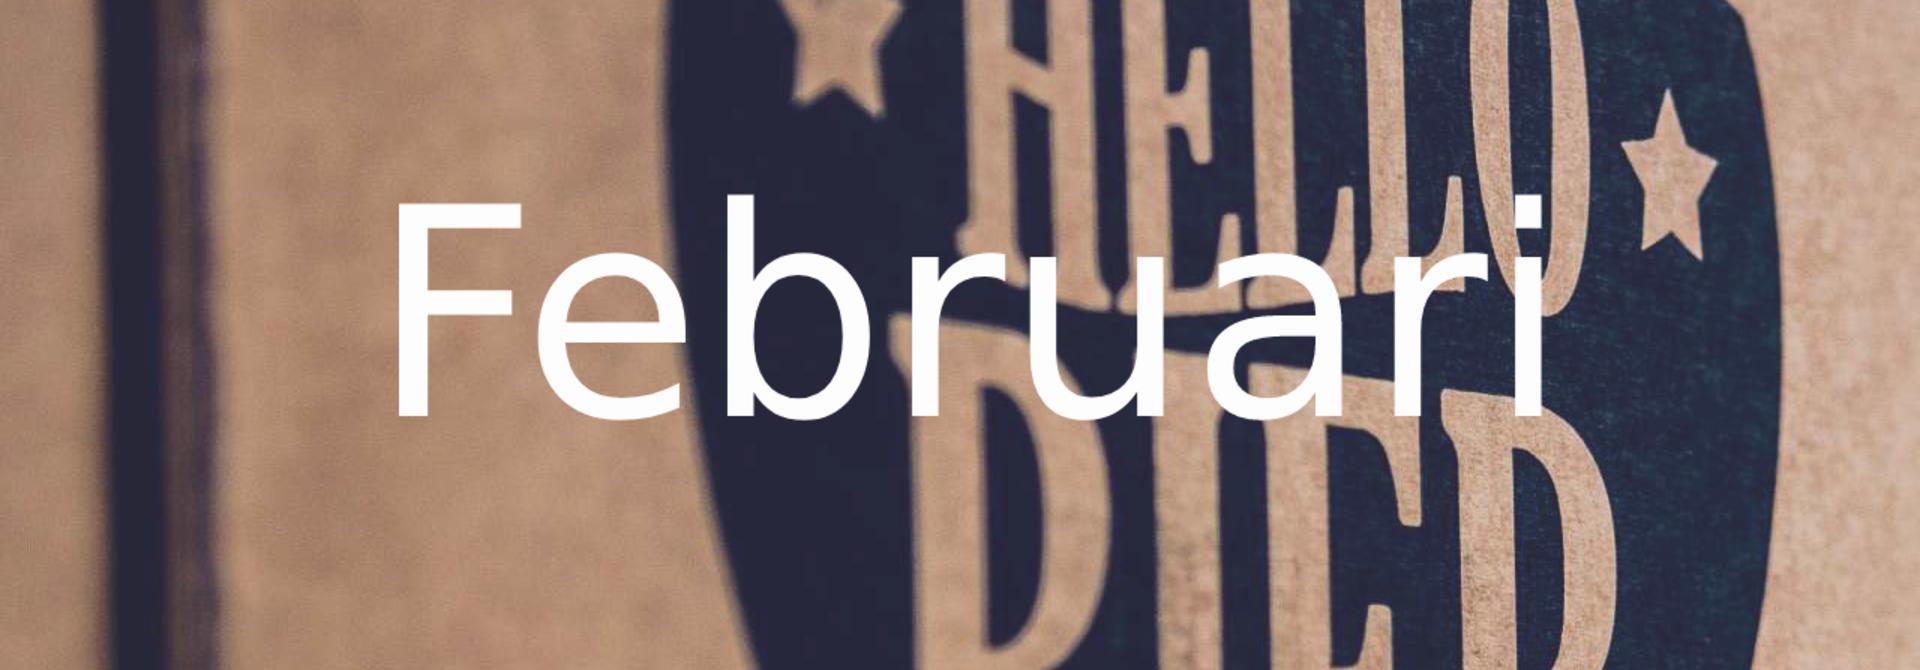 Speciaalbier – bierpakket februari 2017